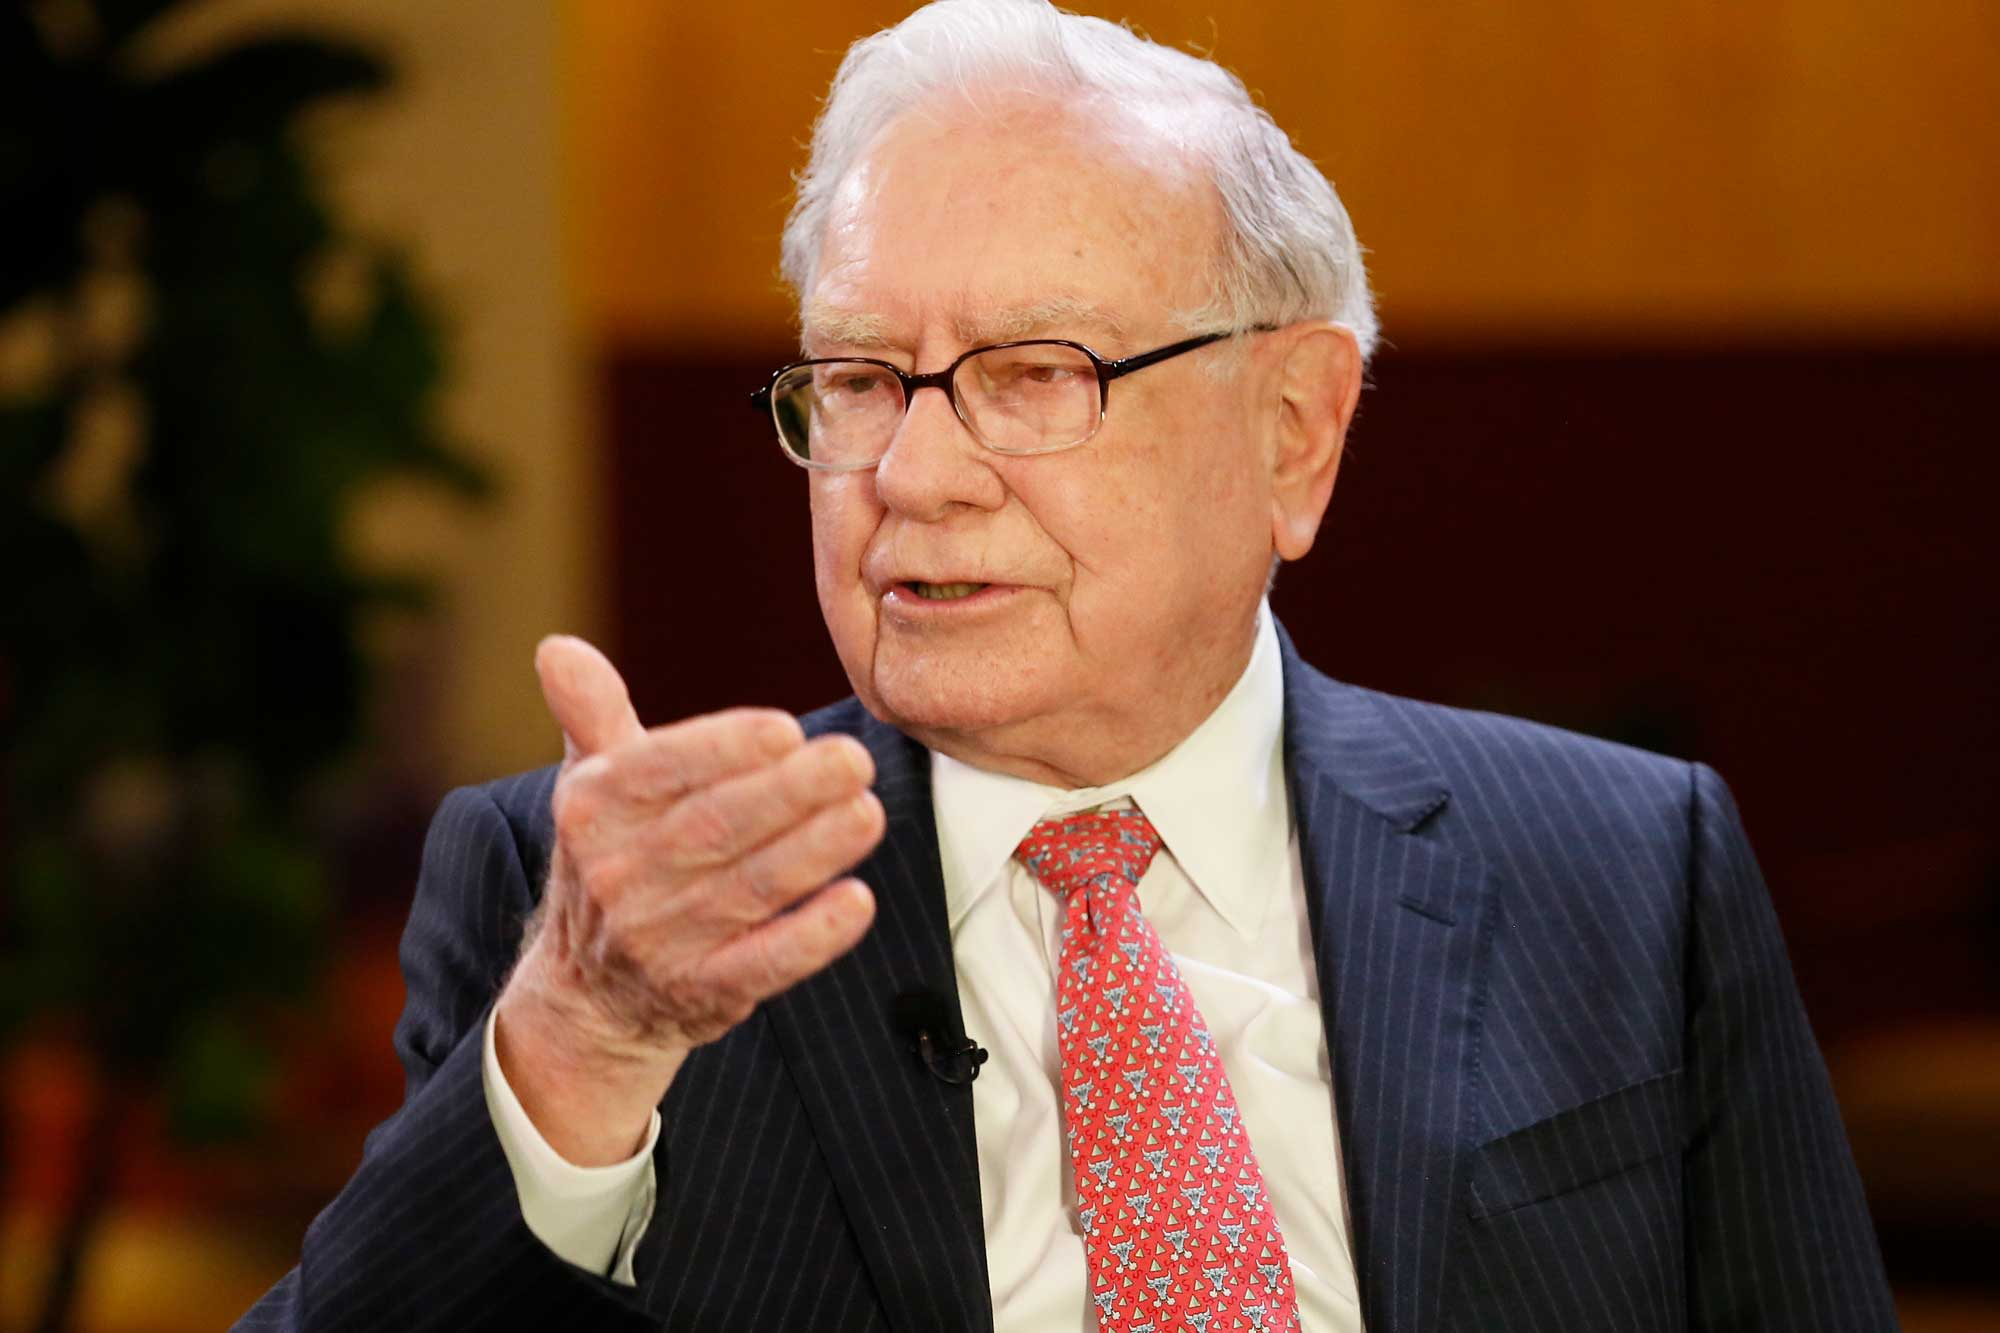 Warren Buffett heads into Berkshire's big weekend with stock underperforming over long term